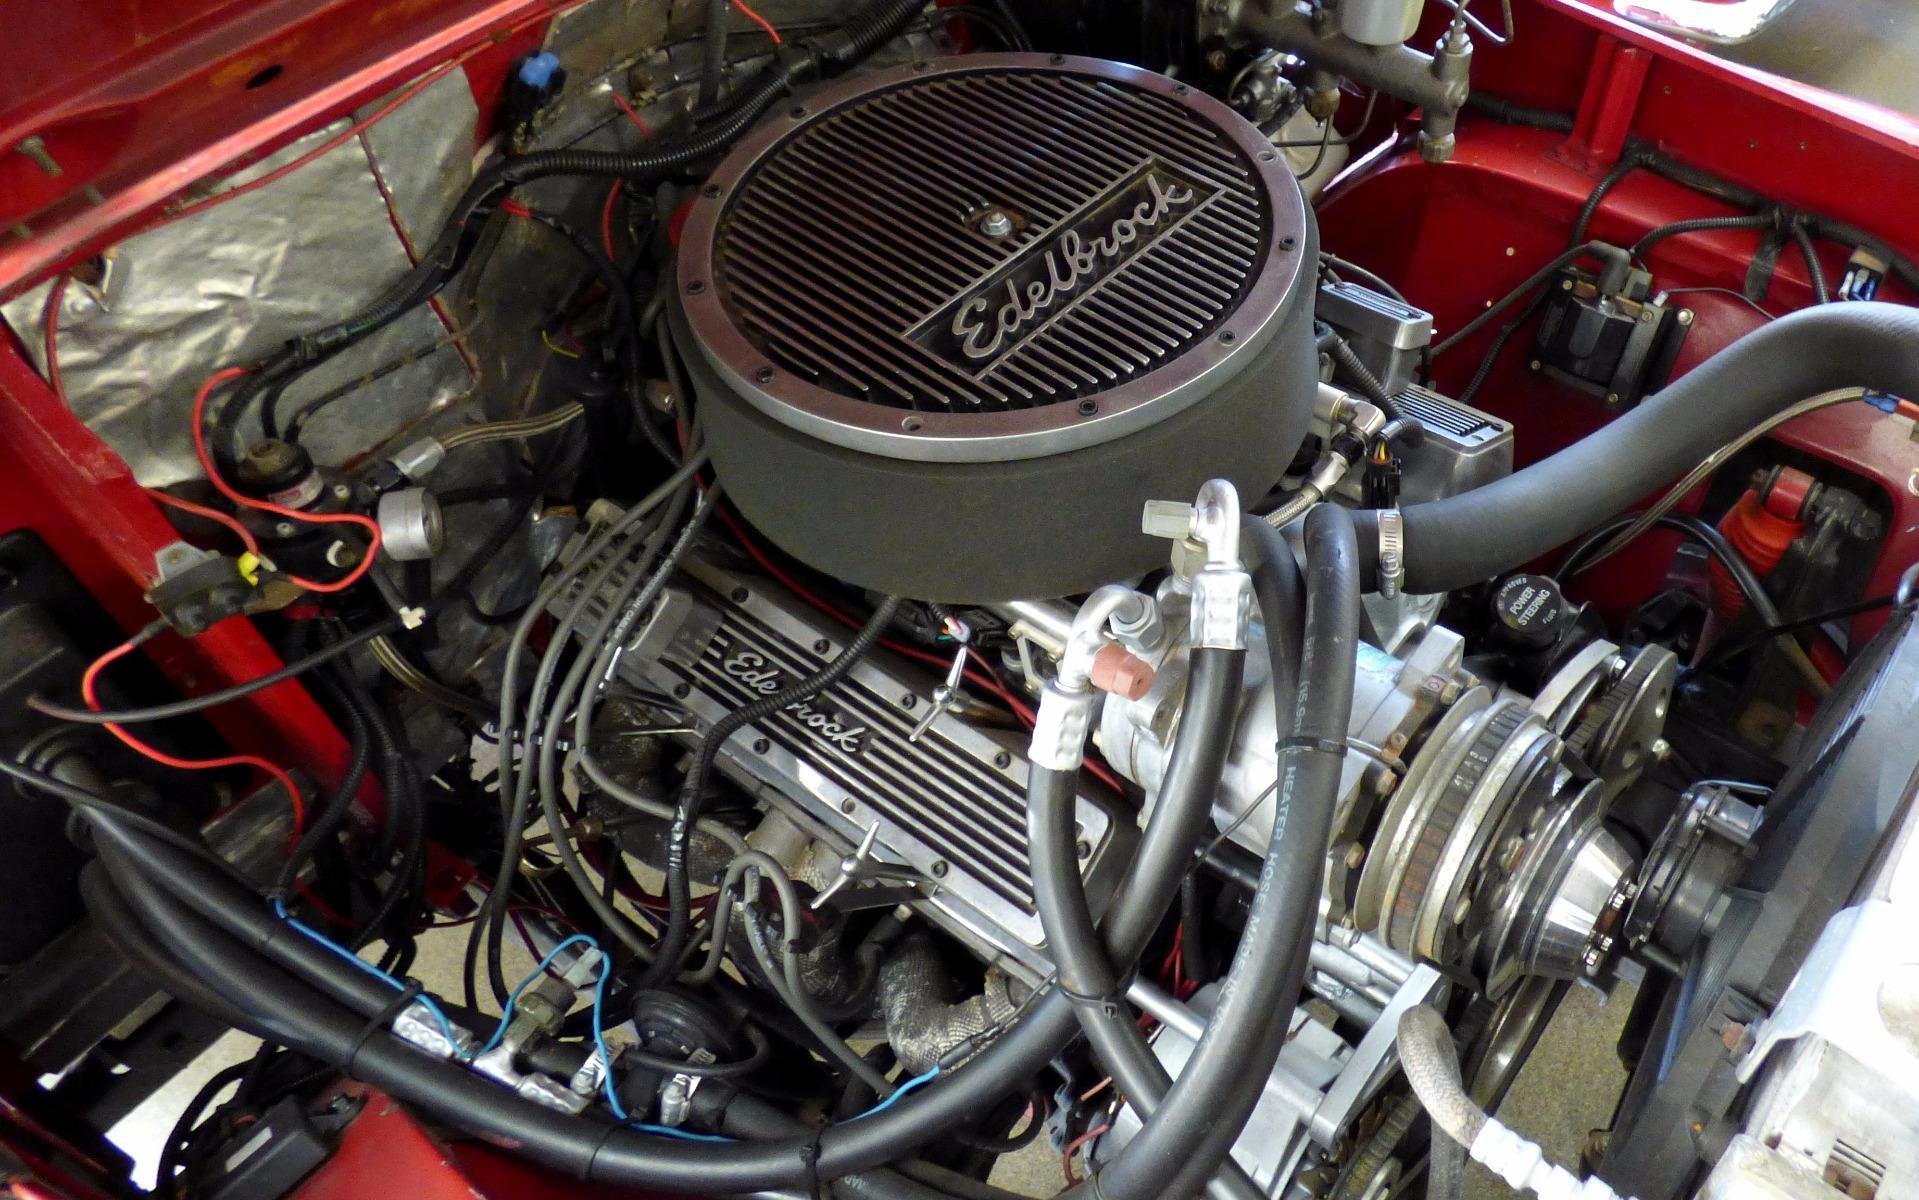 1976 Toyota FJ40 Land Cruiser 4X4